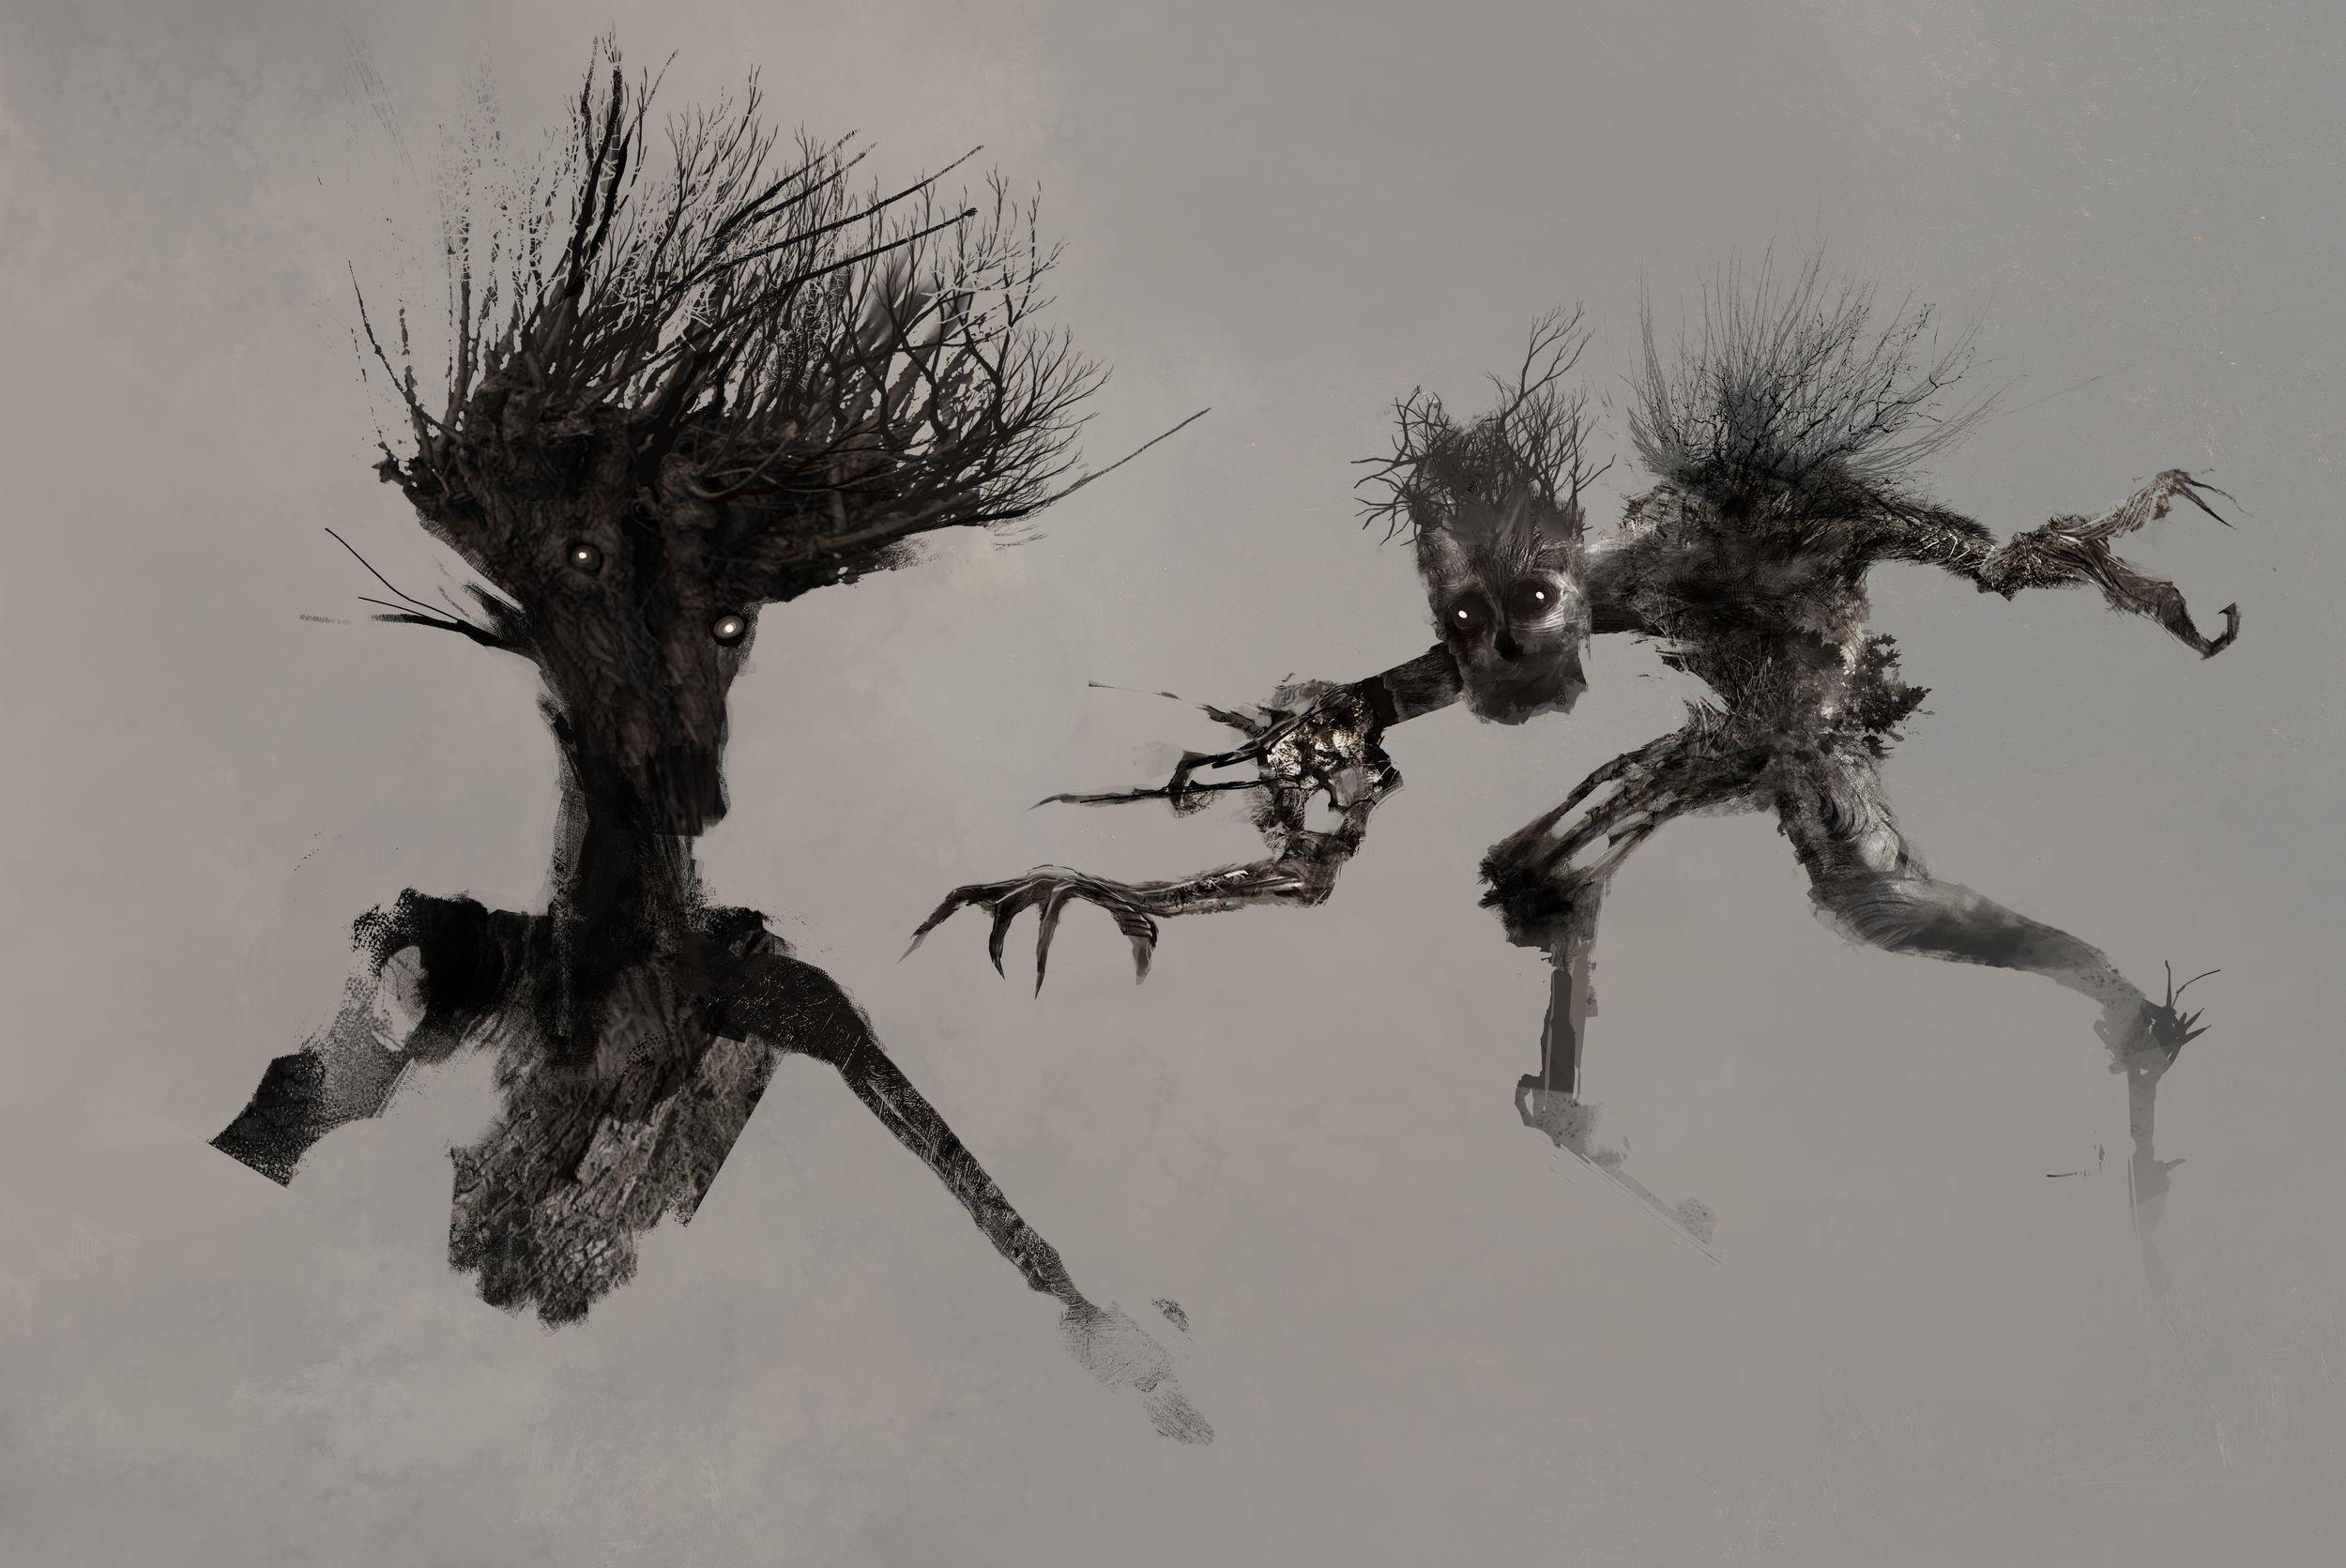 Treemen